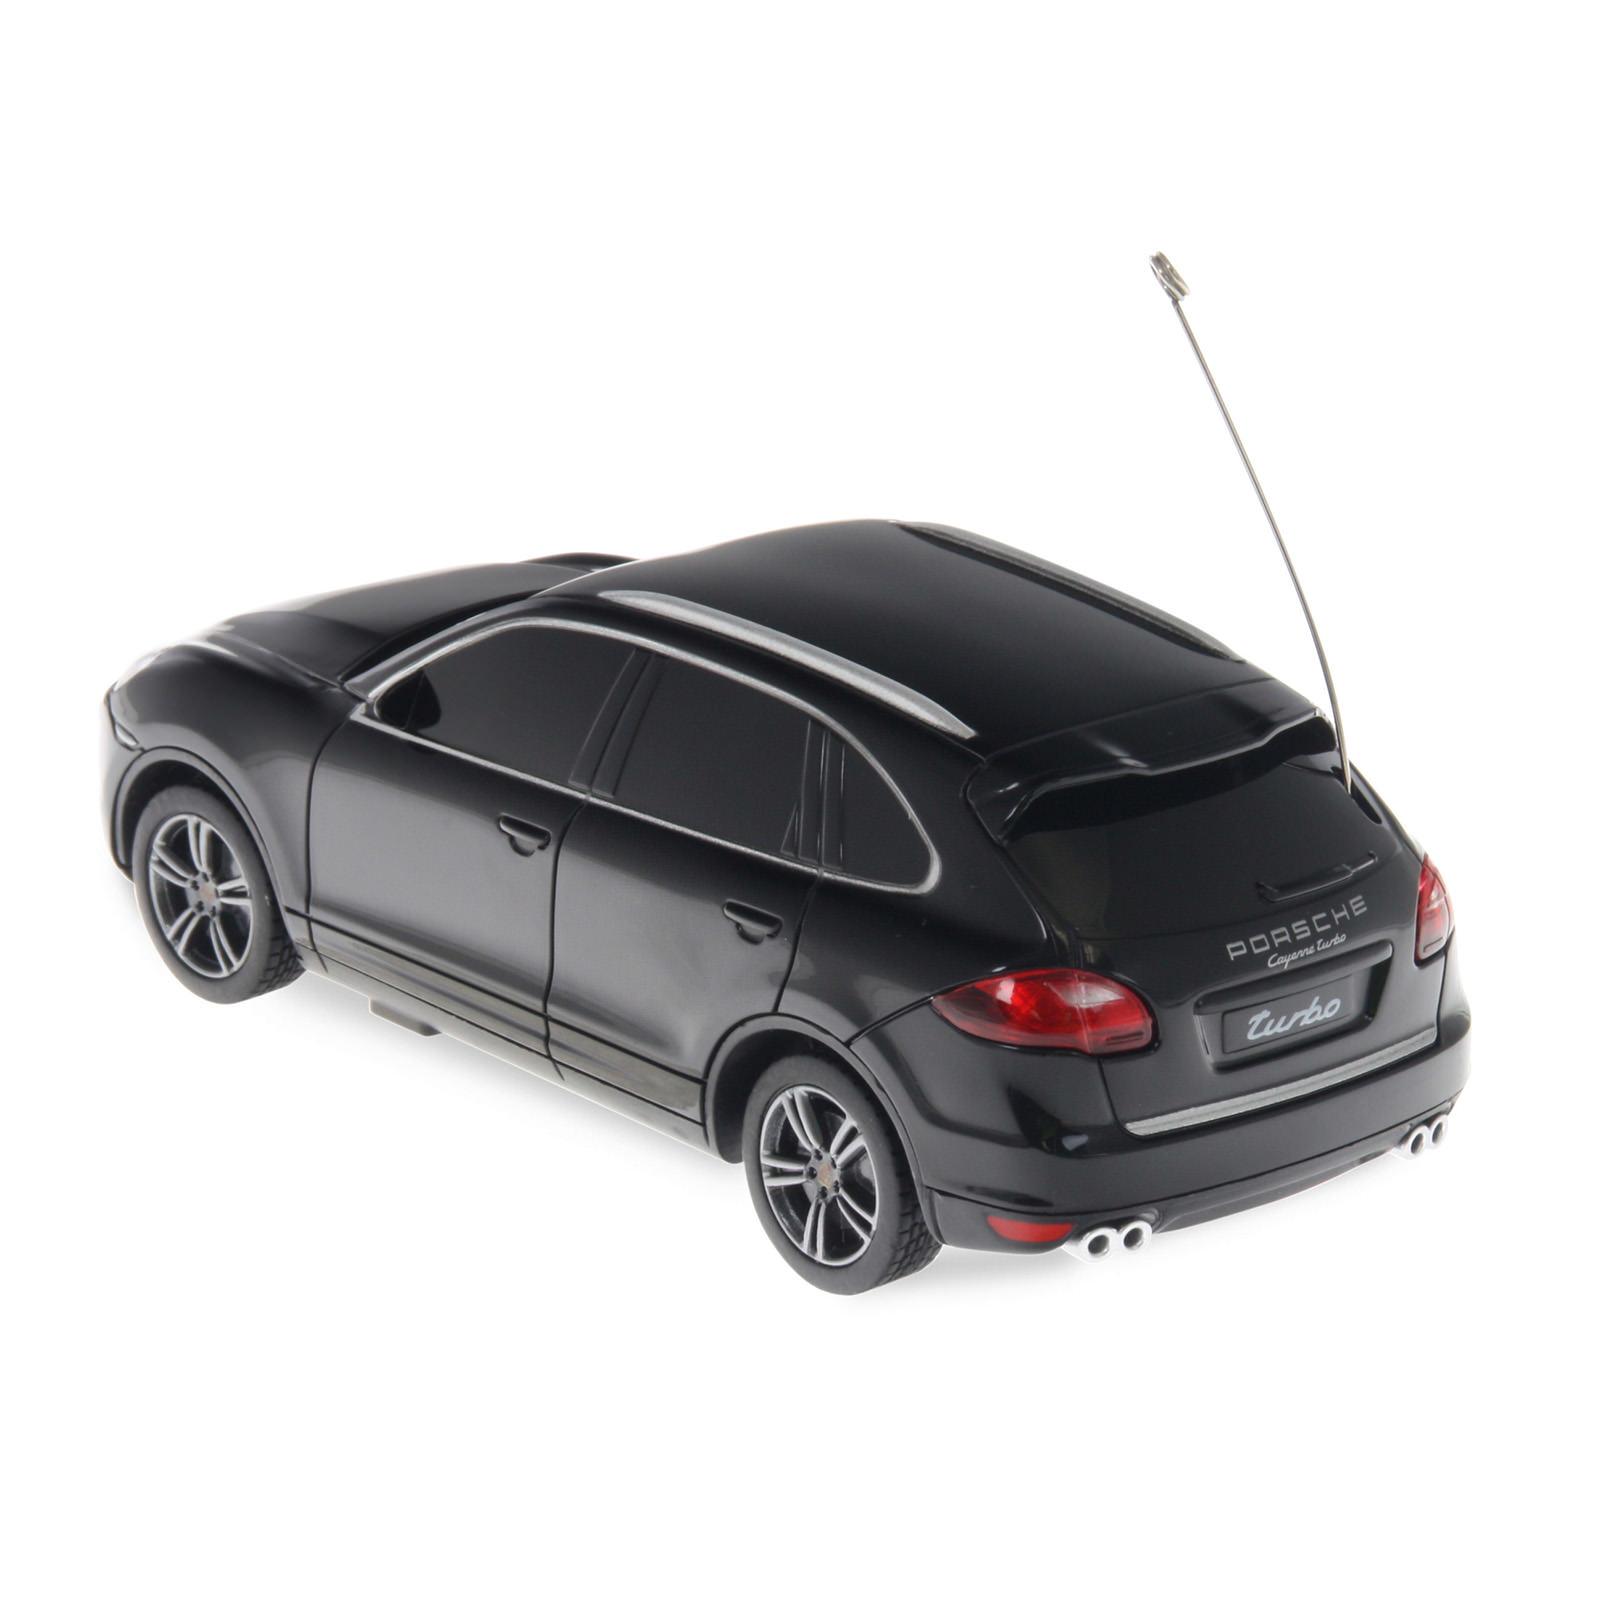 Black Porsche Cayenne: Rastar 50300 Black Porsche Cayenne Turbo 1/32 Scale RC Car